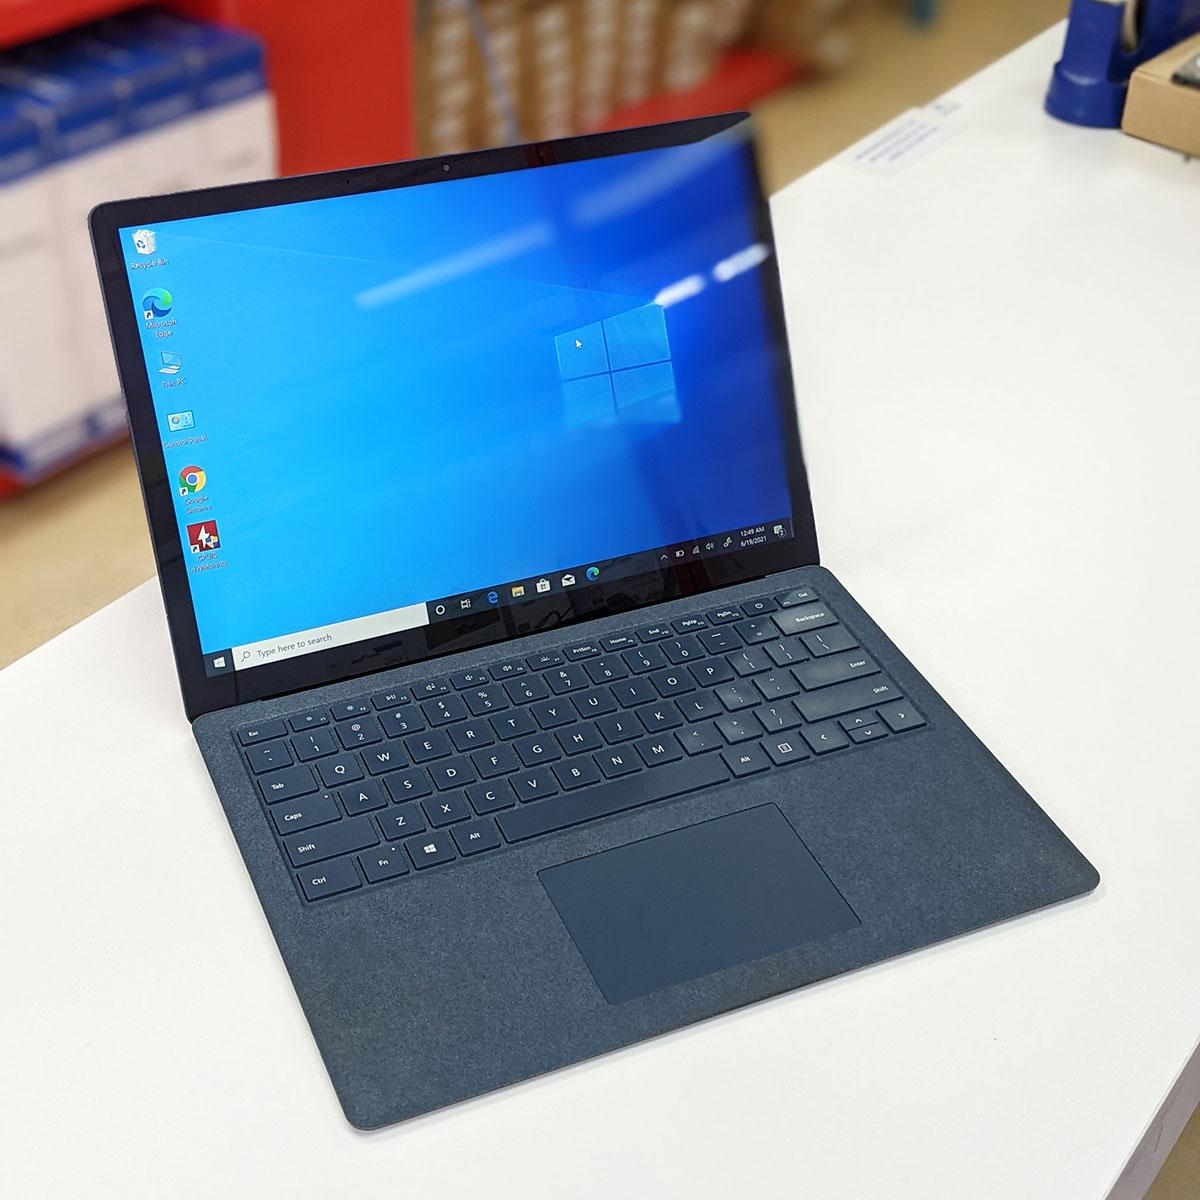 Surface Laptop 1 A1769 Core i5 7200U, Ram 8GB, SSD 256GB, 2K cảm ứng